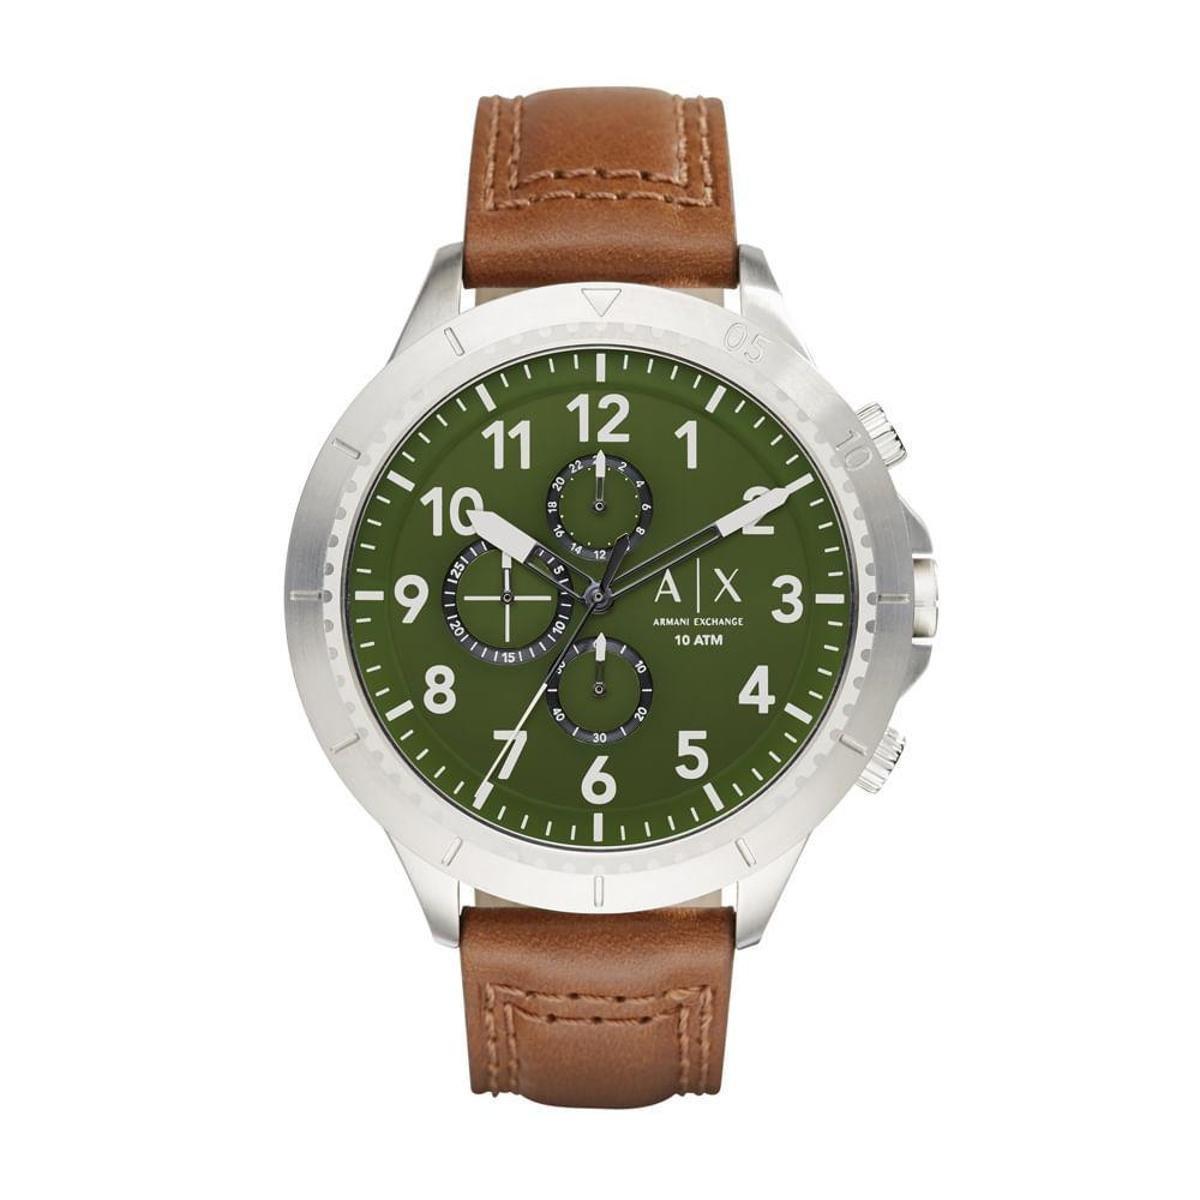 964af9ac5c571 Relógio Armani Exchange AeroRacer Masculino - Compre Agora